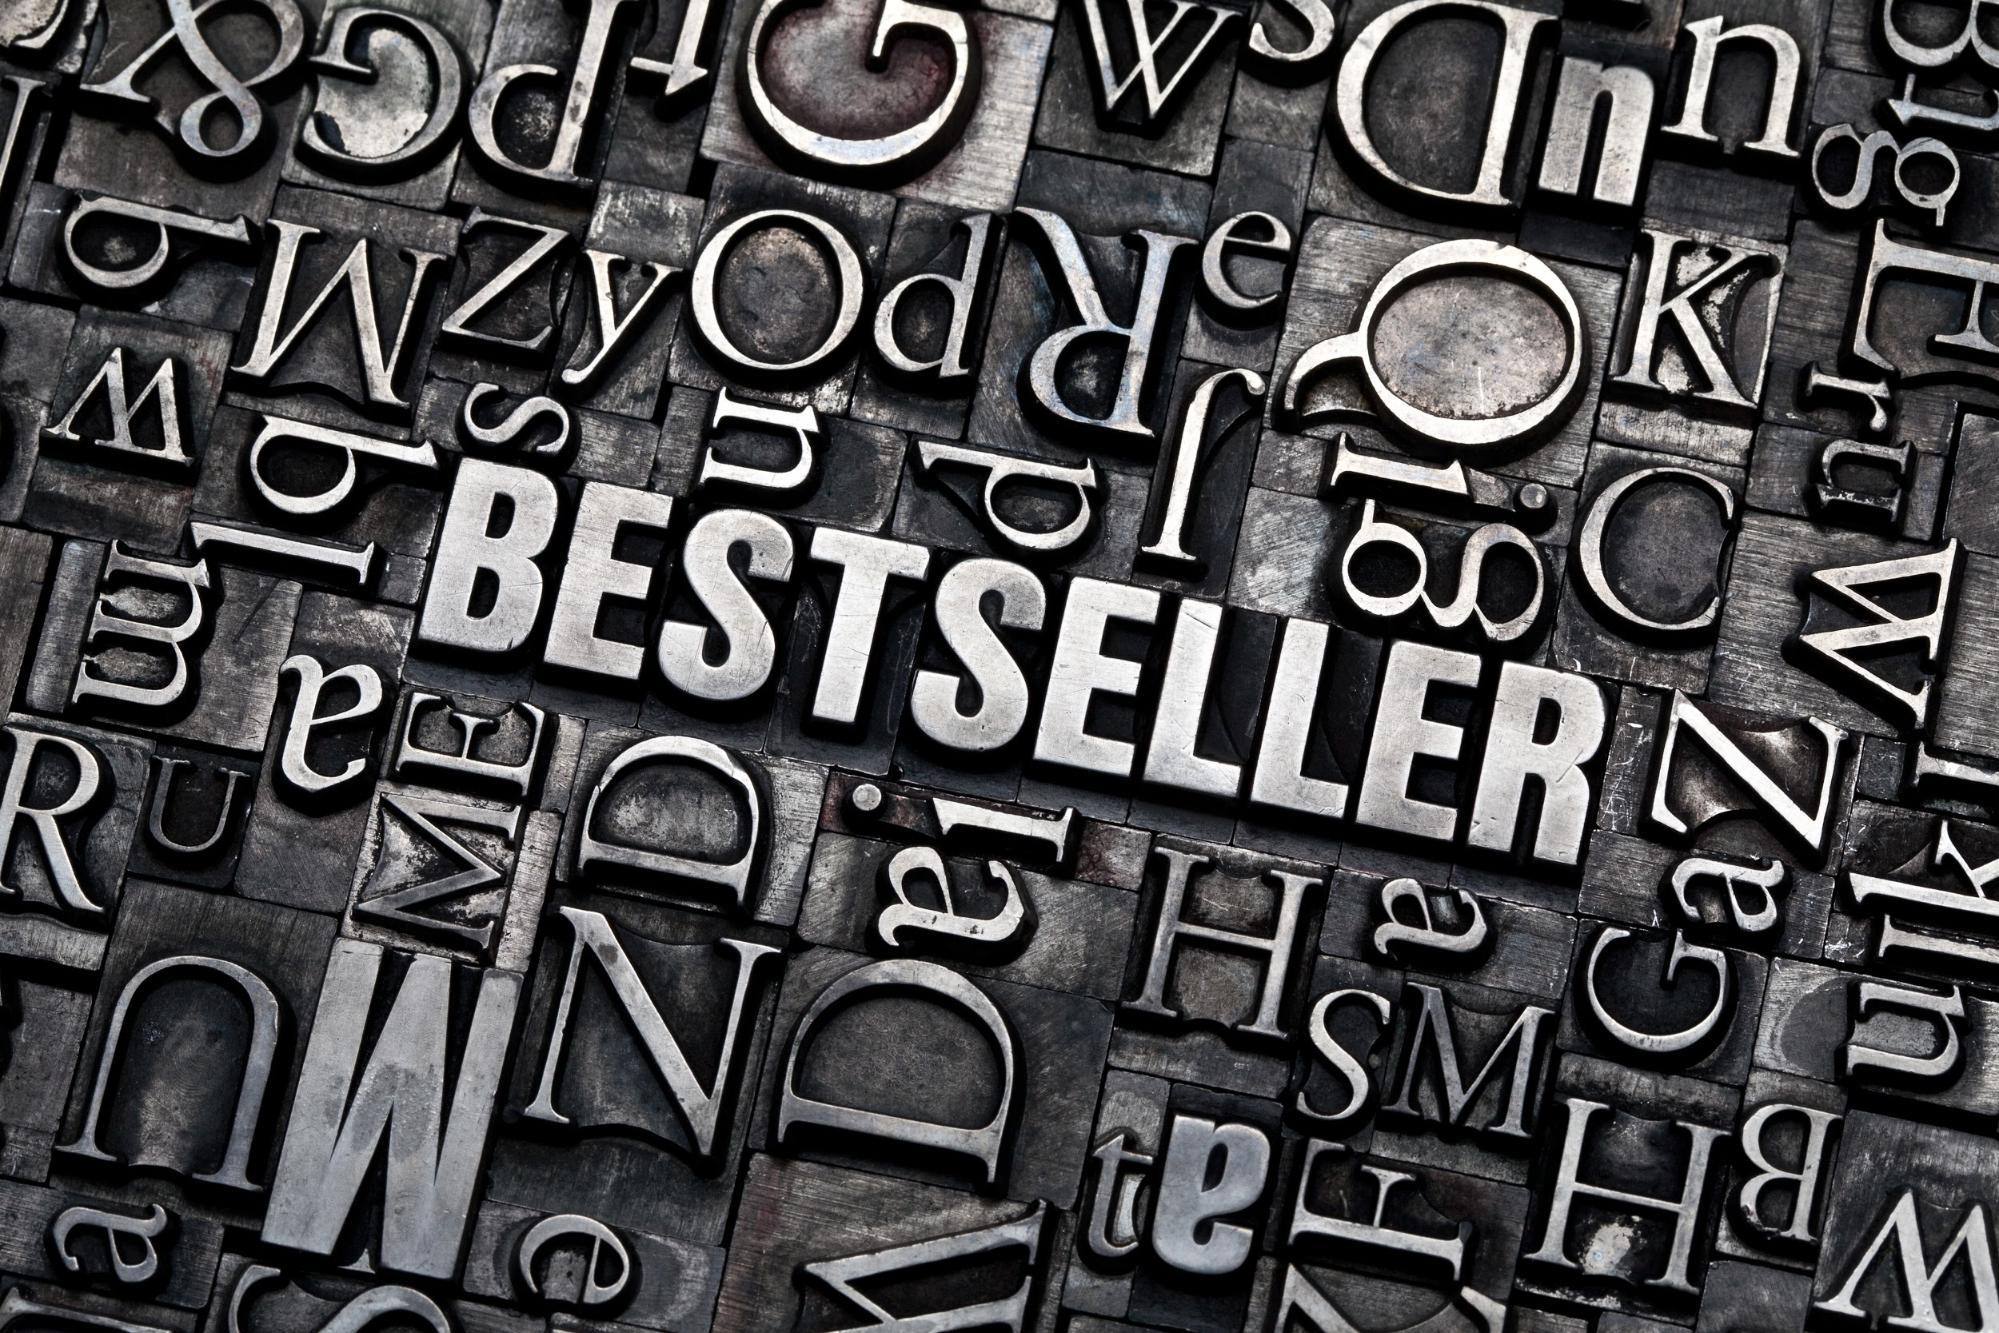 bestselling ebooks